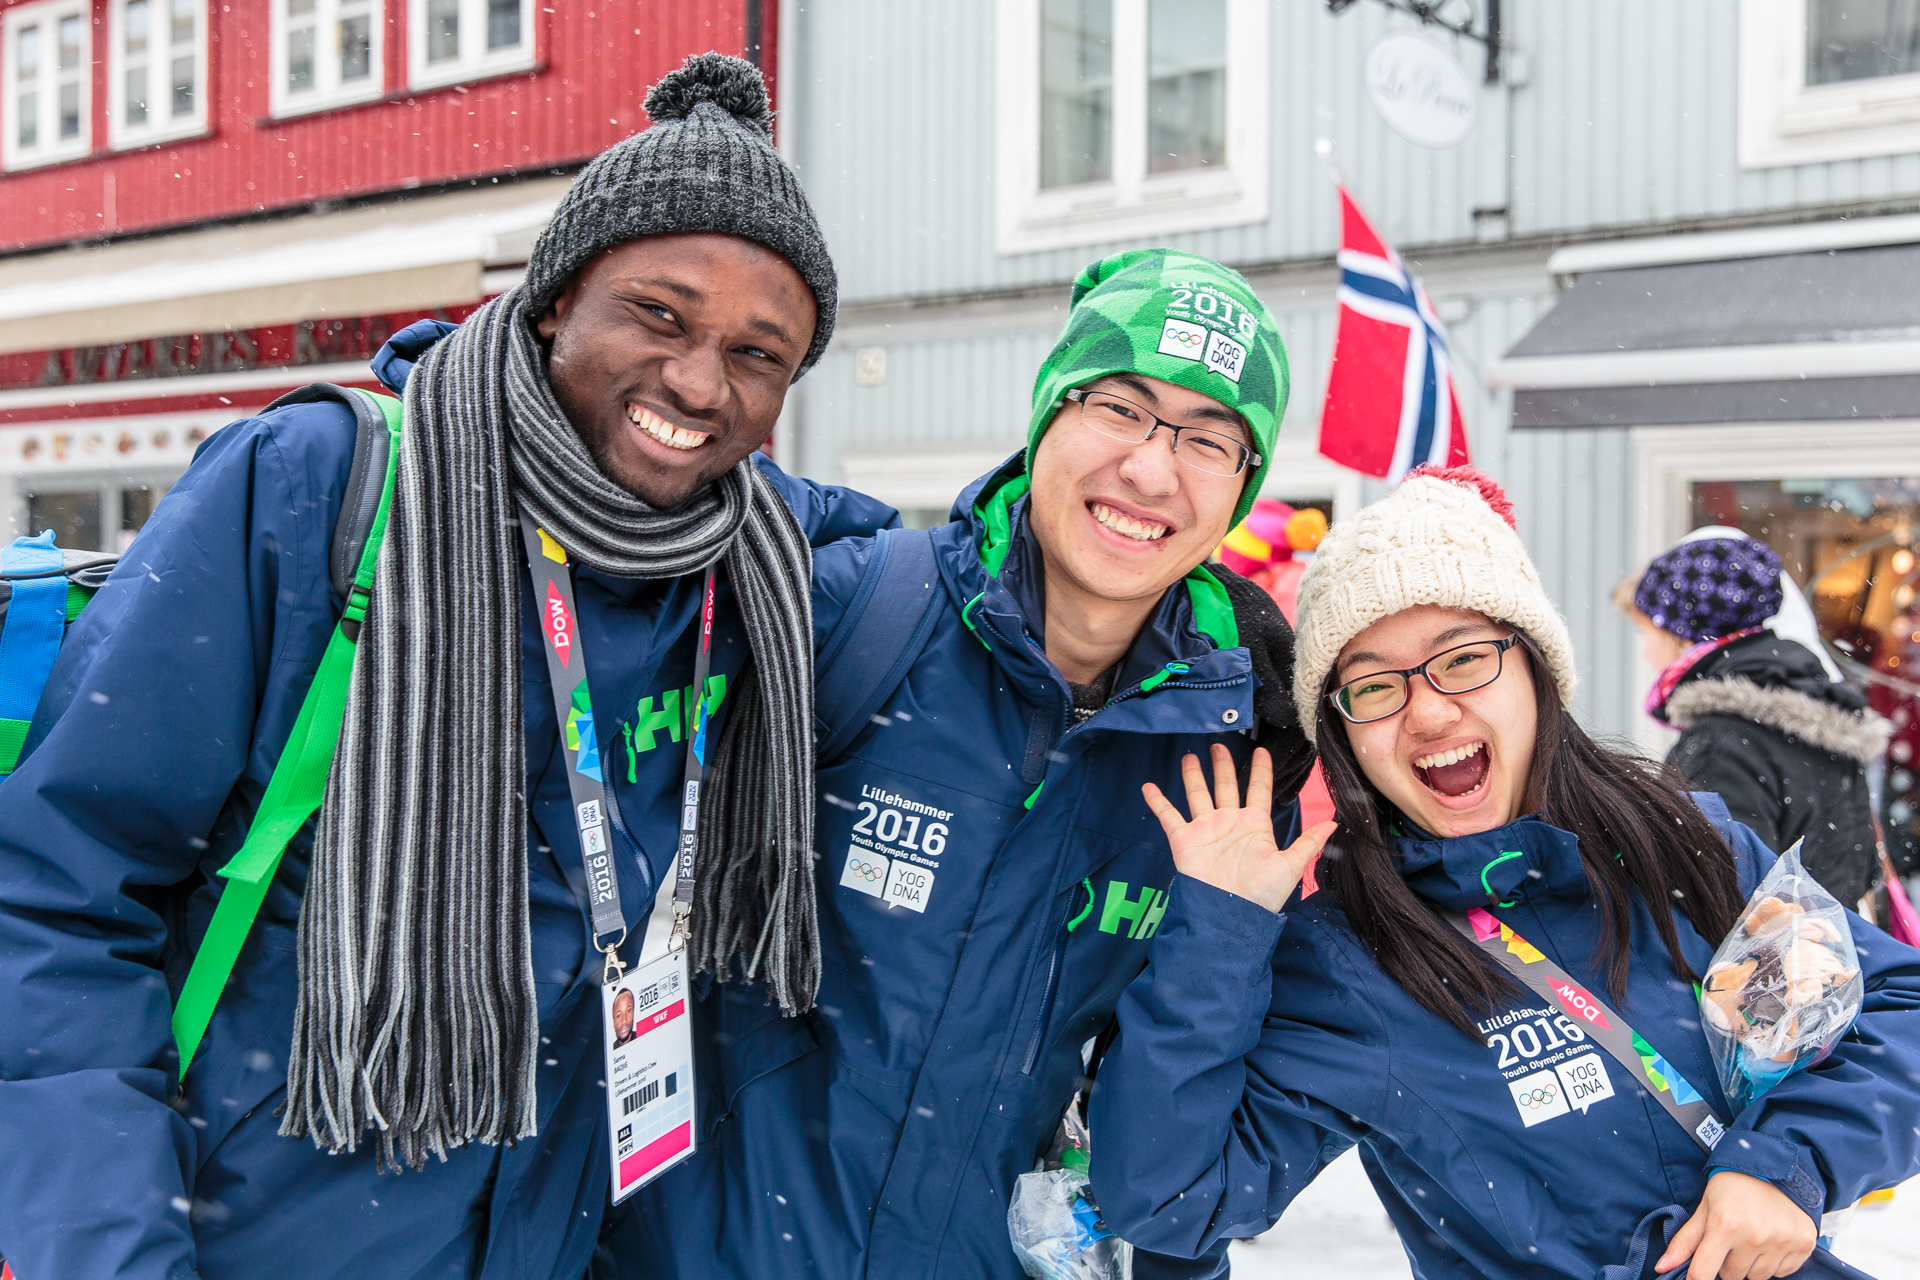 Lillehammer 2016 - Caroline Strømhylden9.jpg